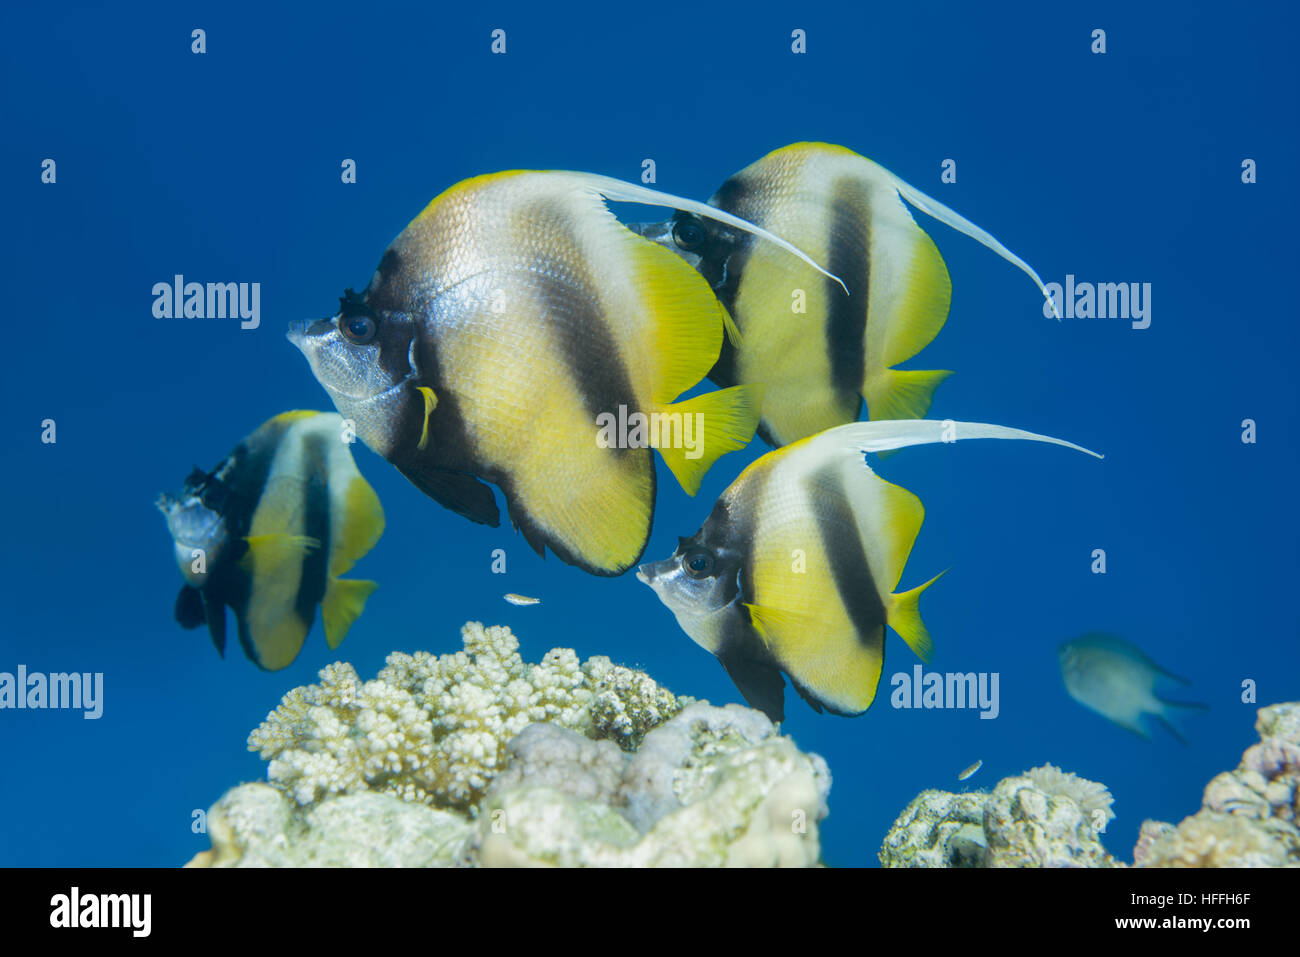 of fish pennant coralfish longfin bannerfish reef